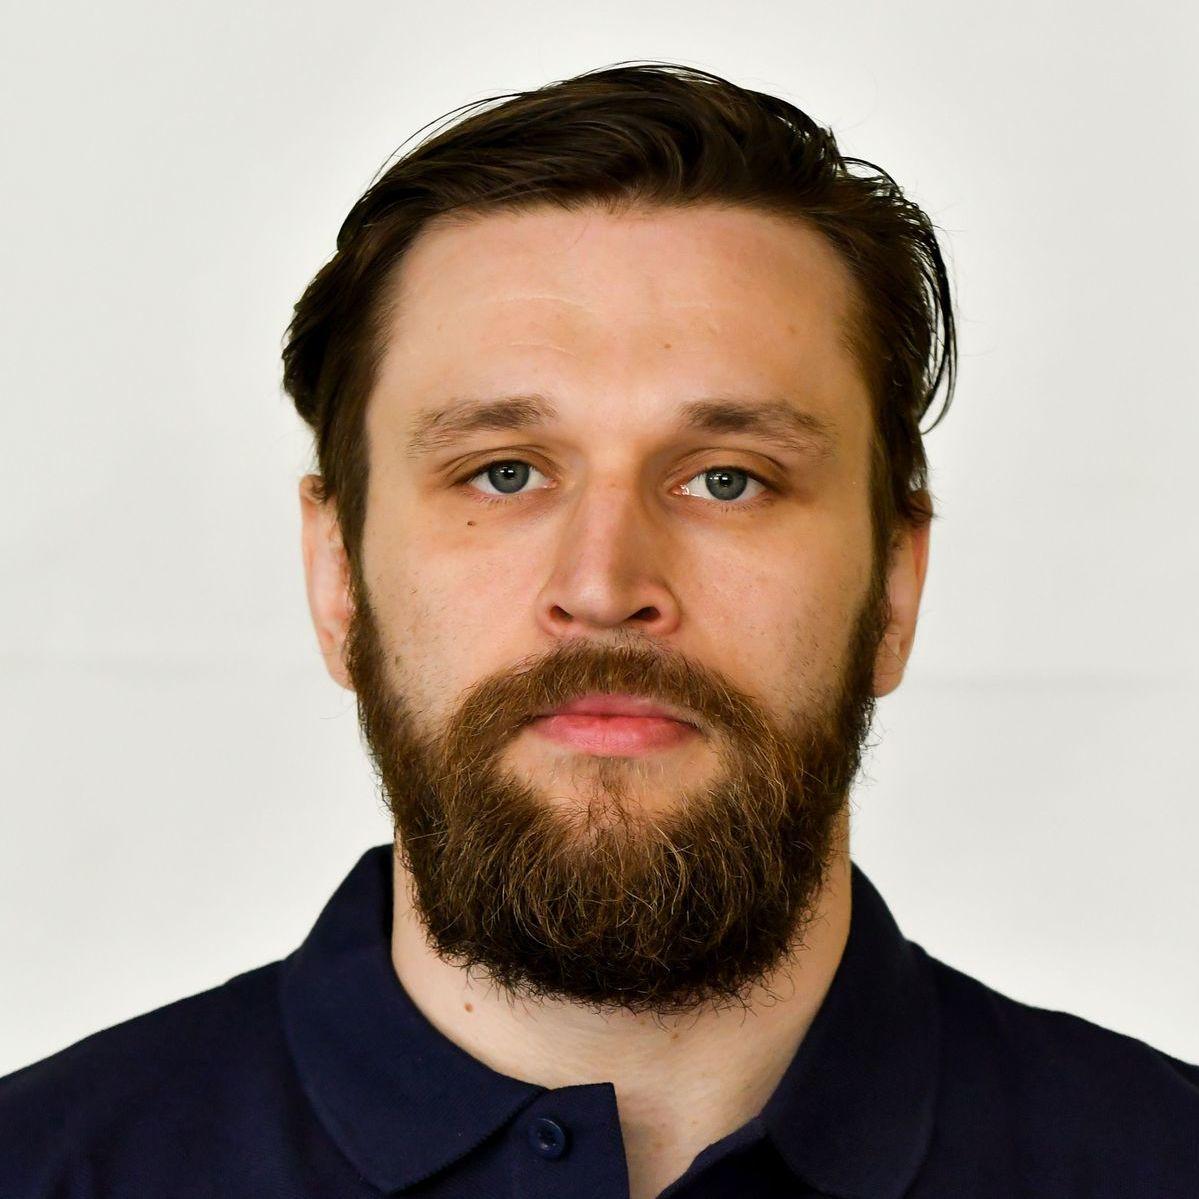 Marek Hovorka